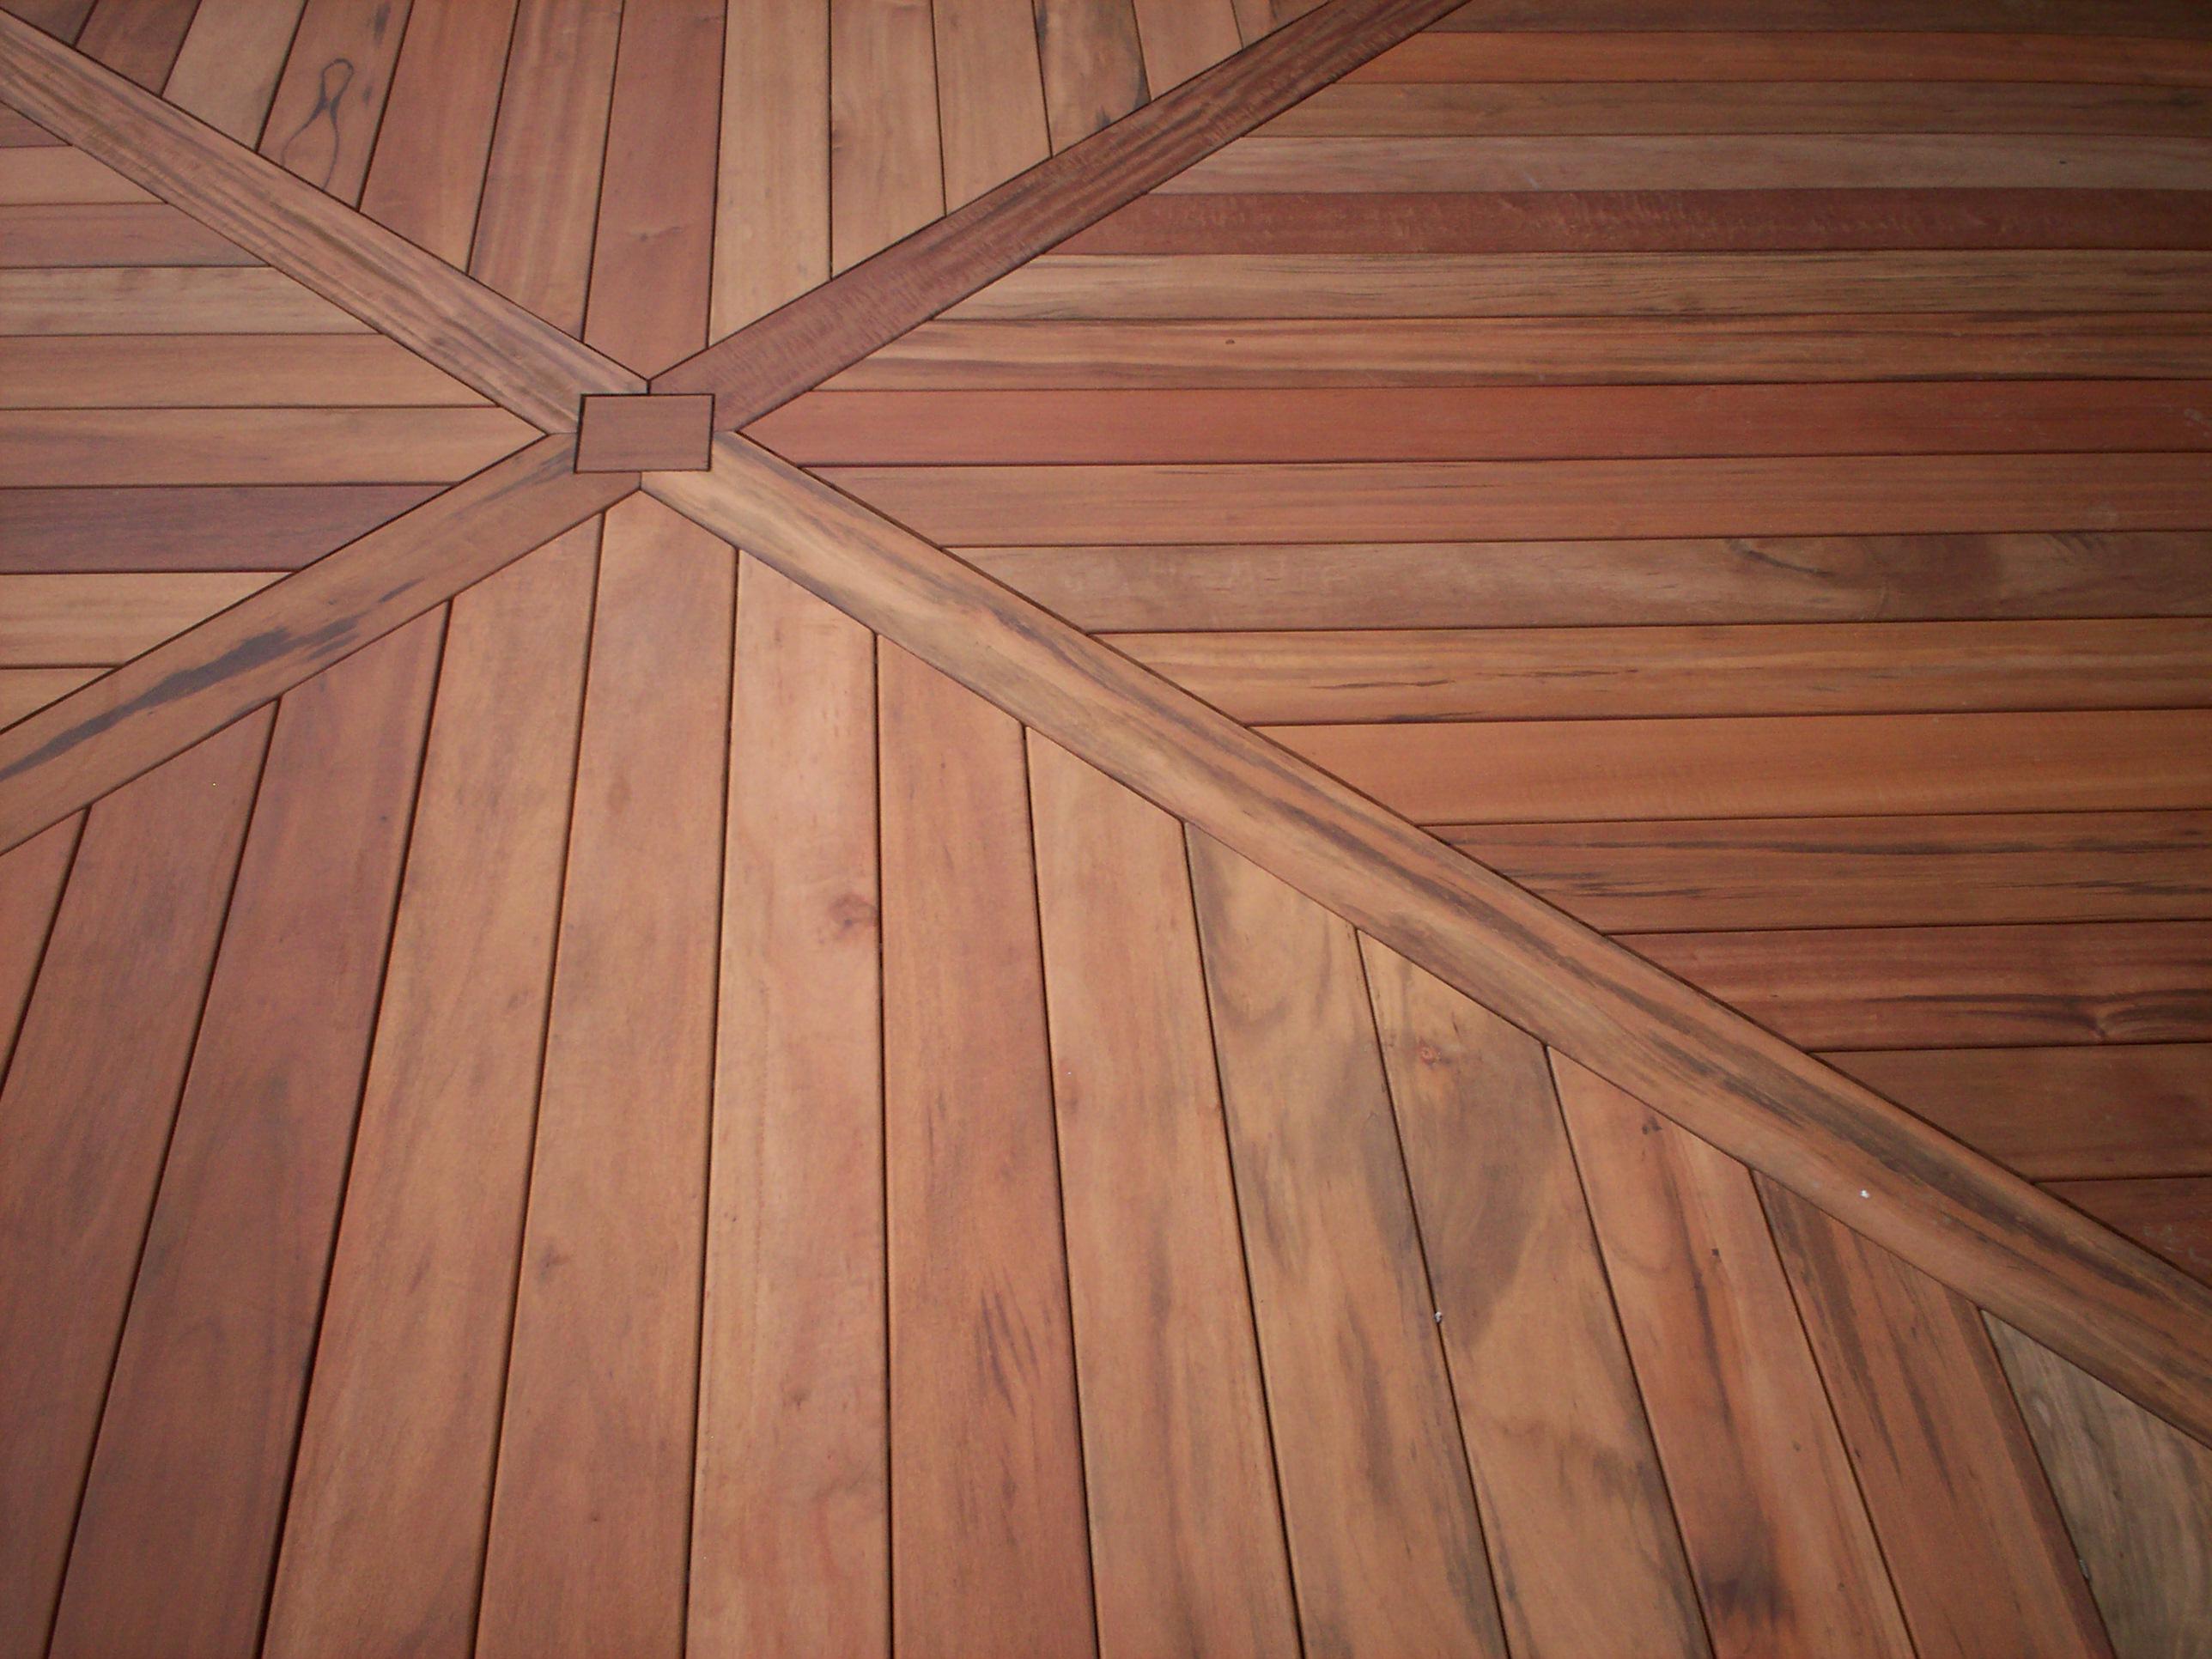 Custom Decks With Floor Board Patterns St Louis Decks